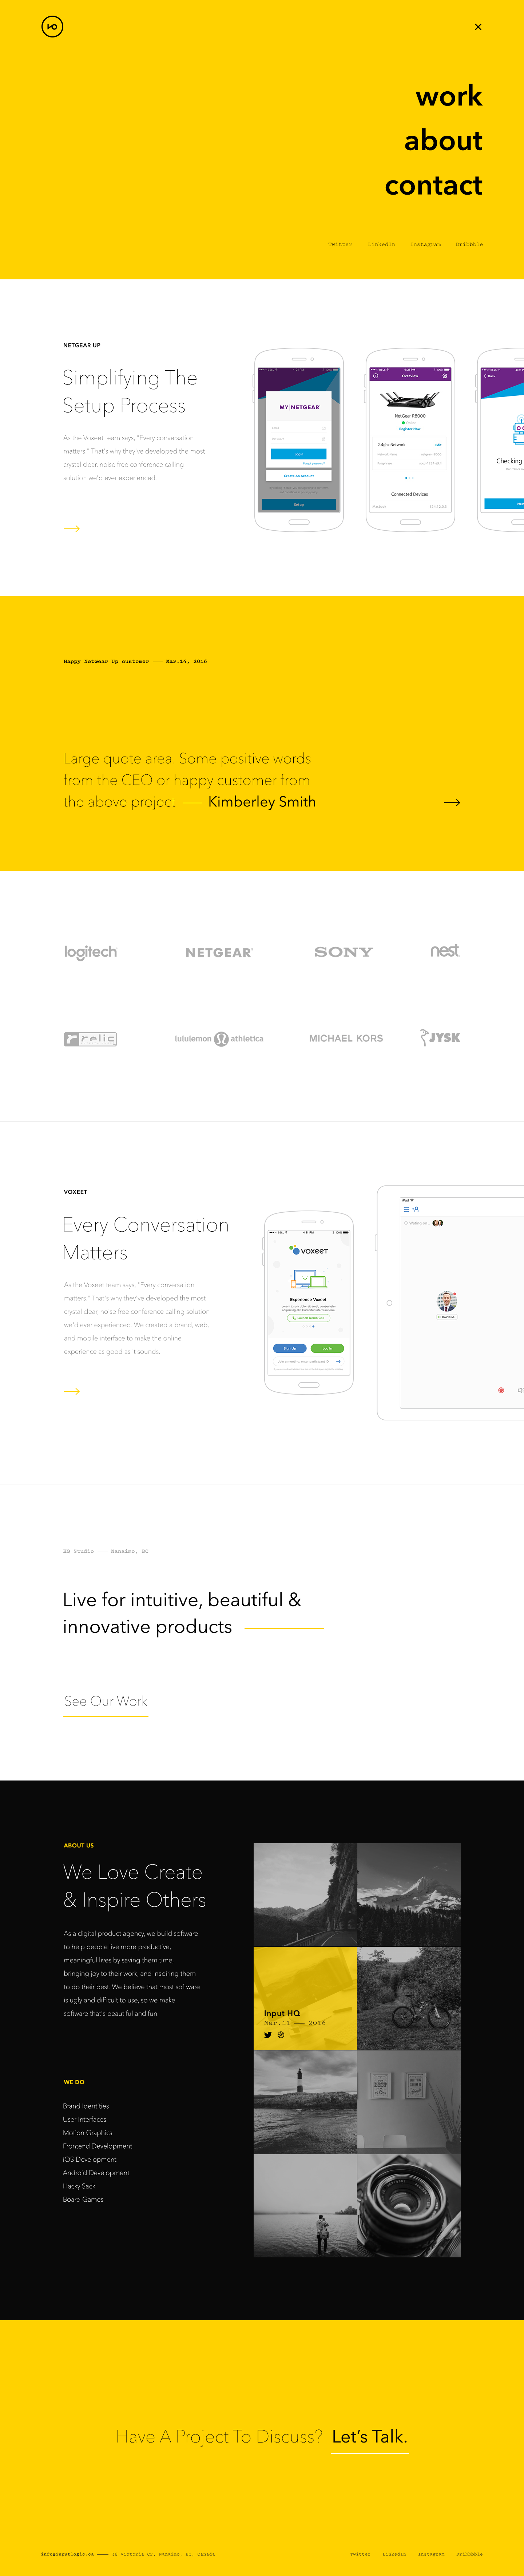 Menu Active Png By Dmitri Litvinov Web Design Web Design Projects Landing Page